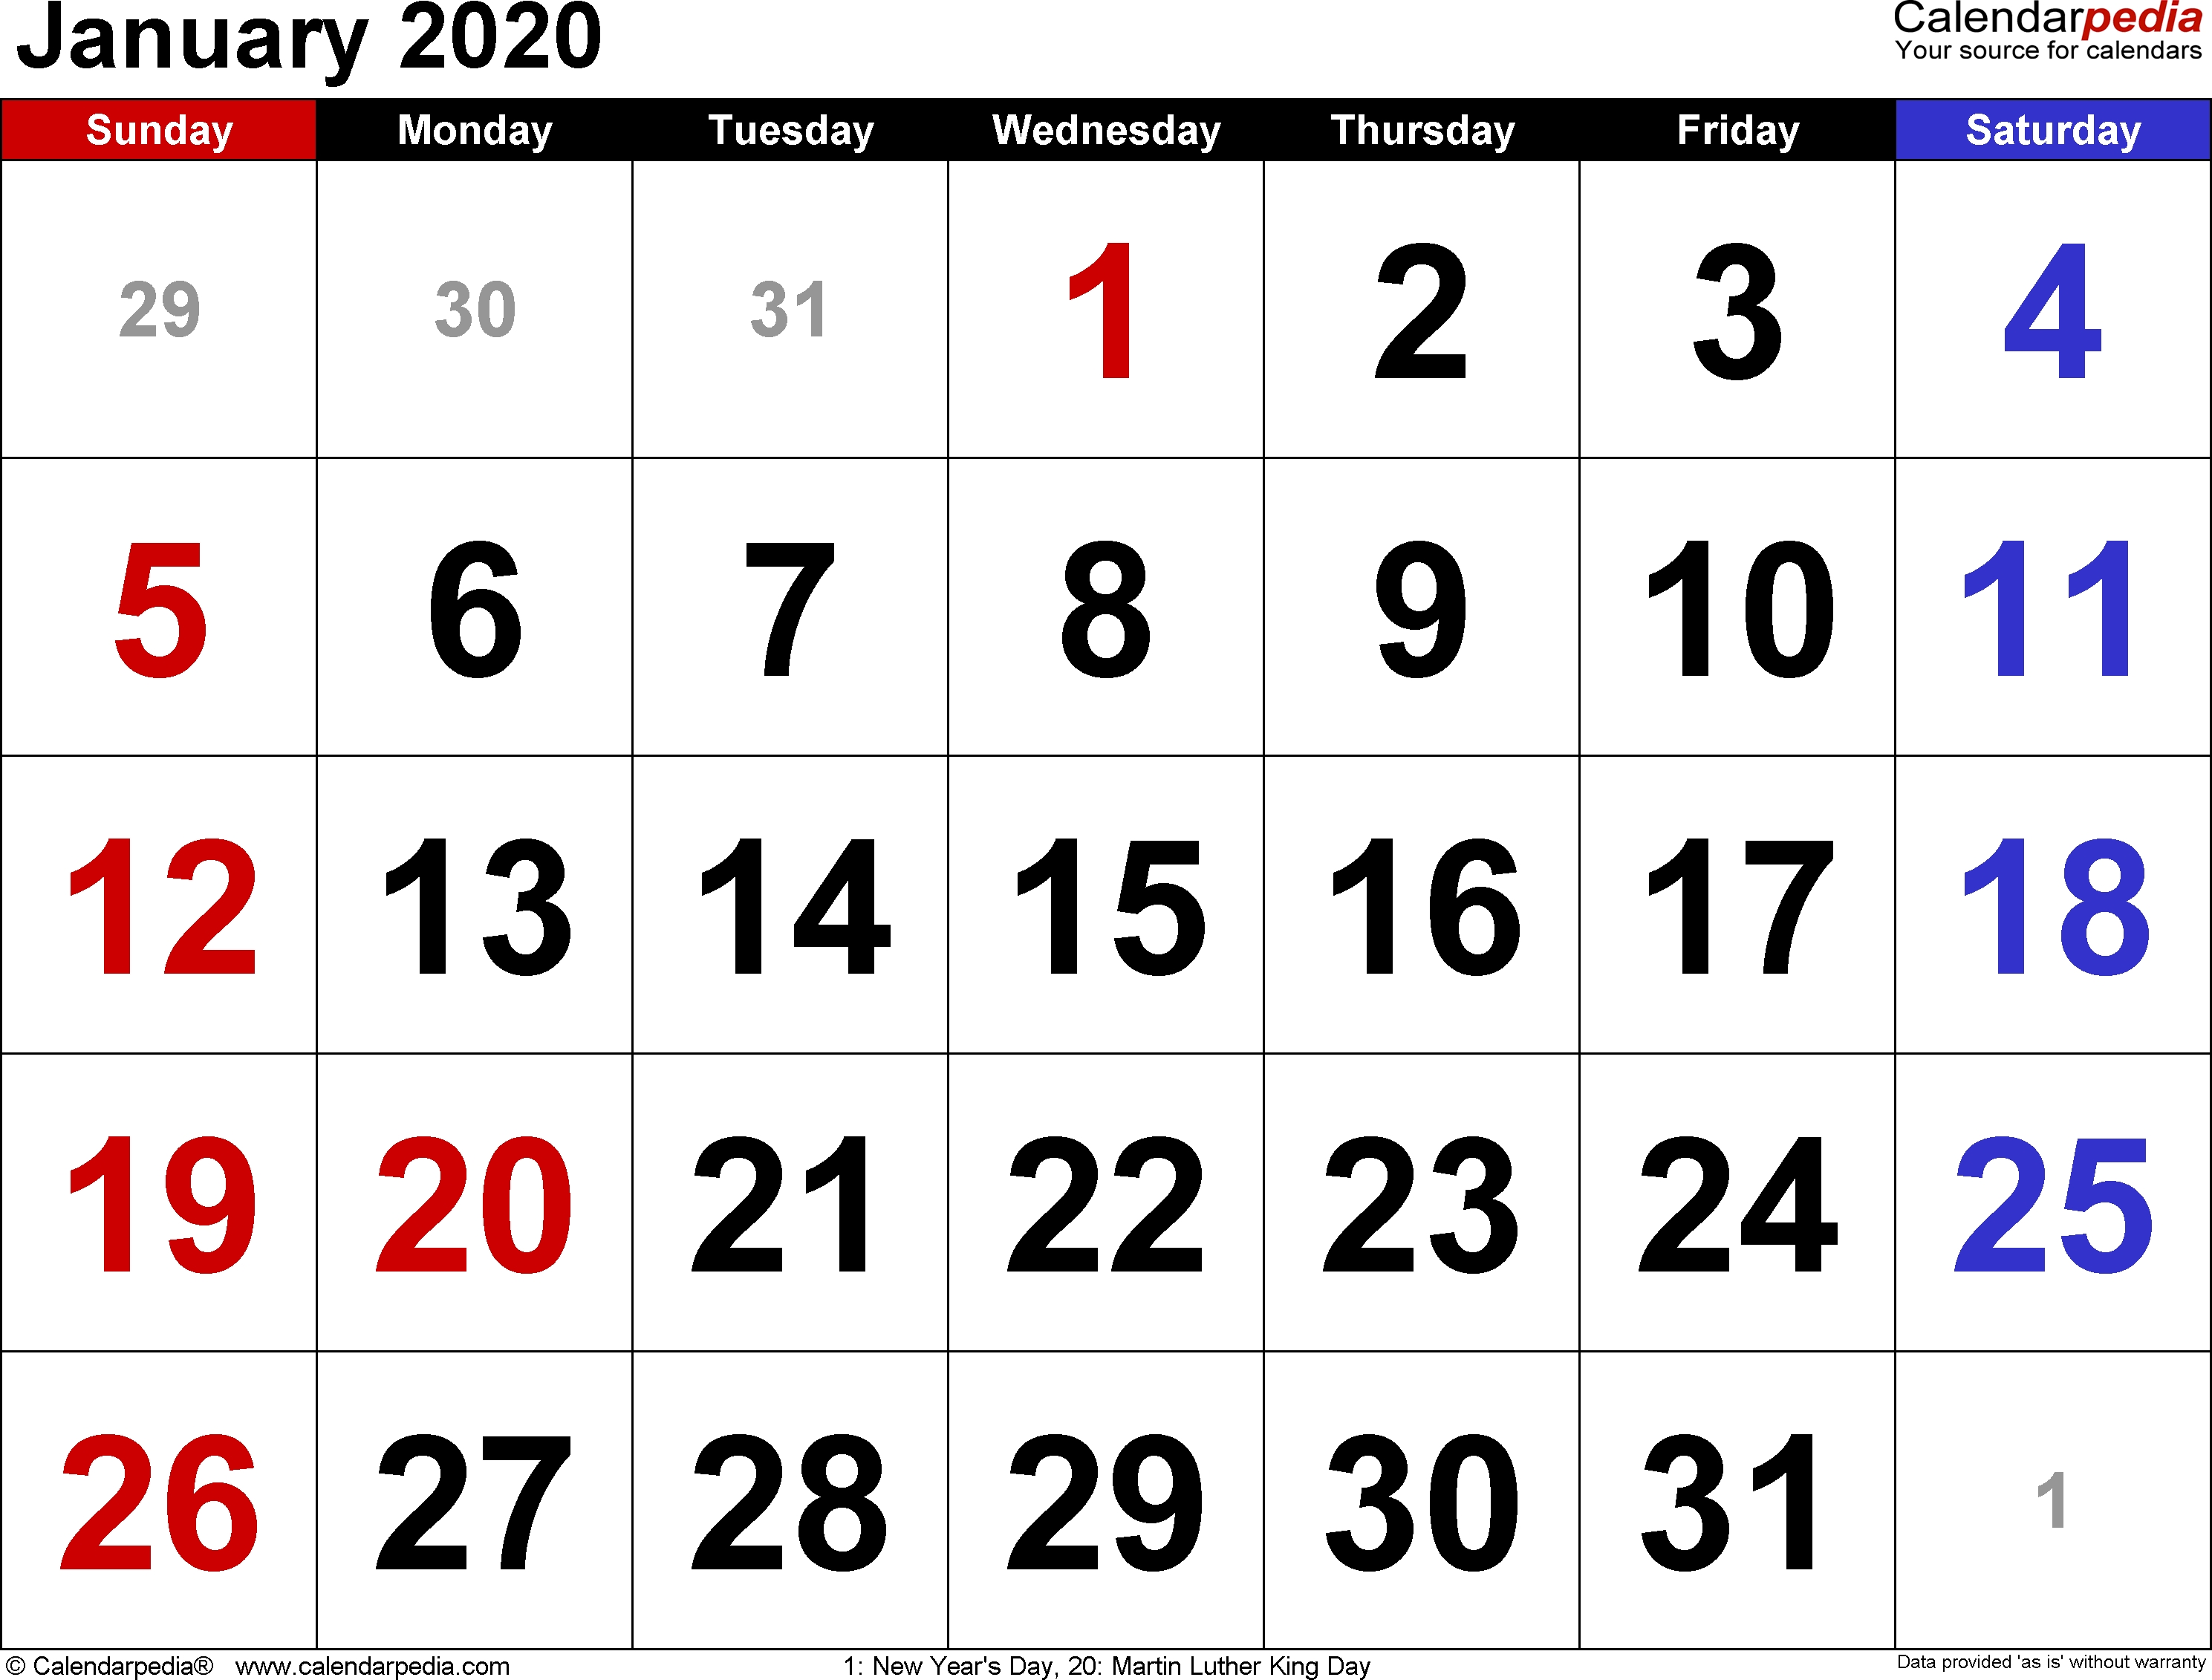 January 2020 Calendars For Word, Excel & Pdf-January 2020 Calendar Australia